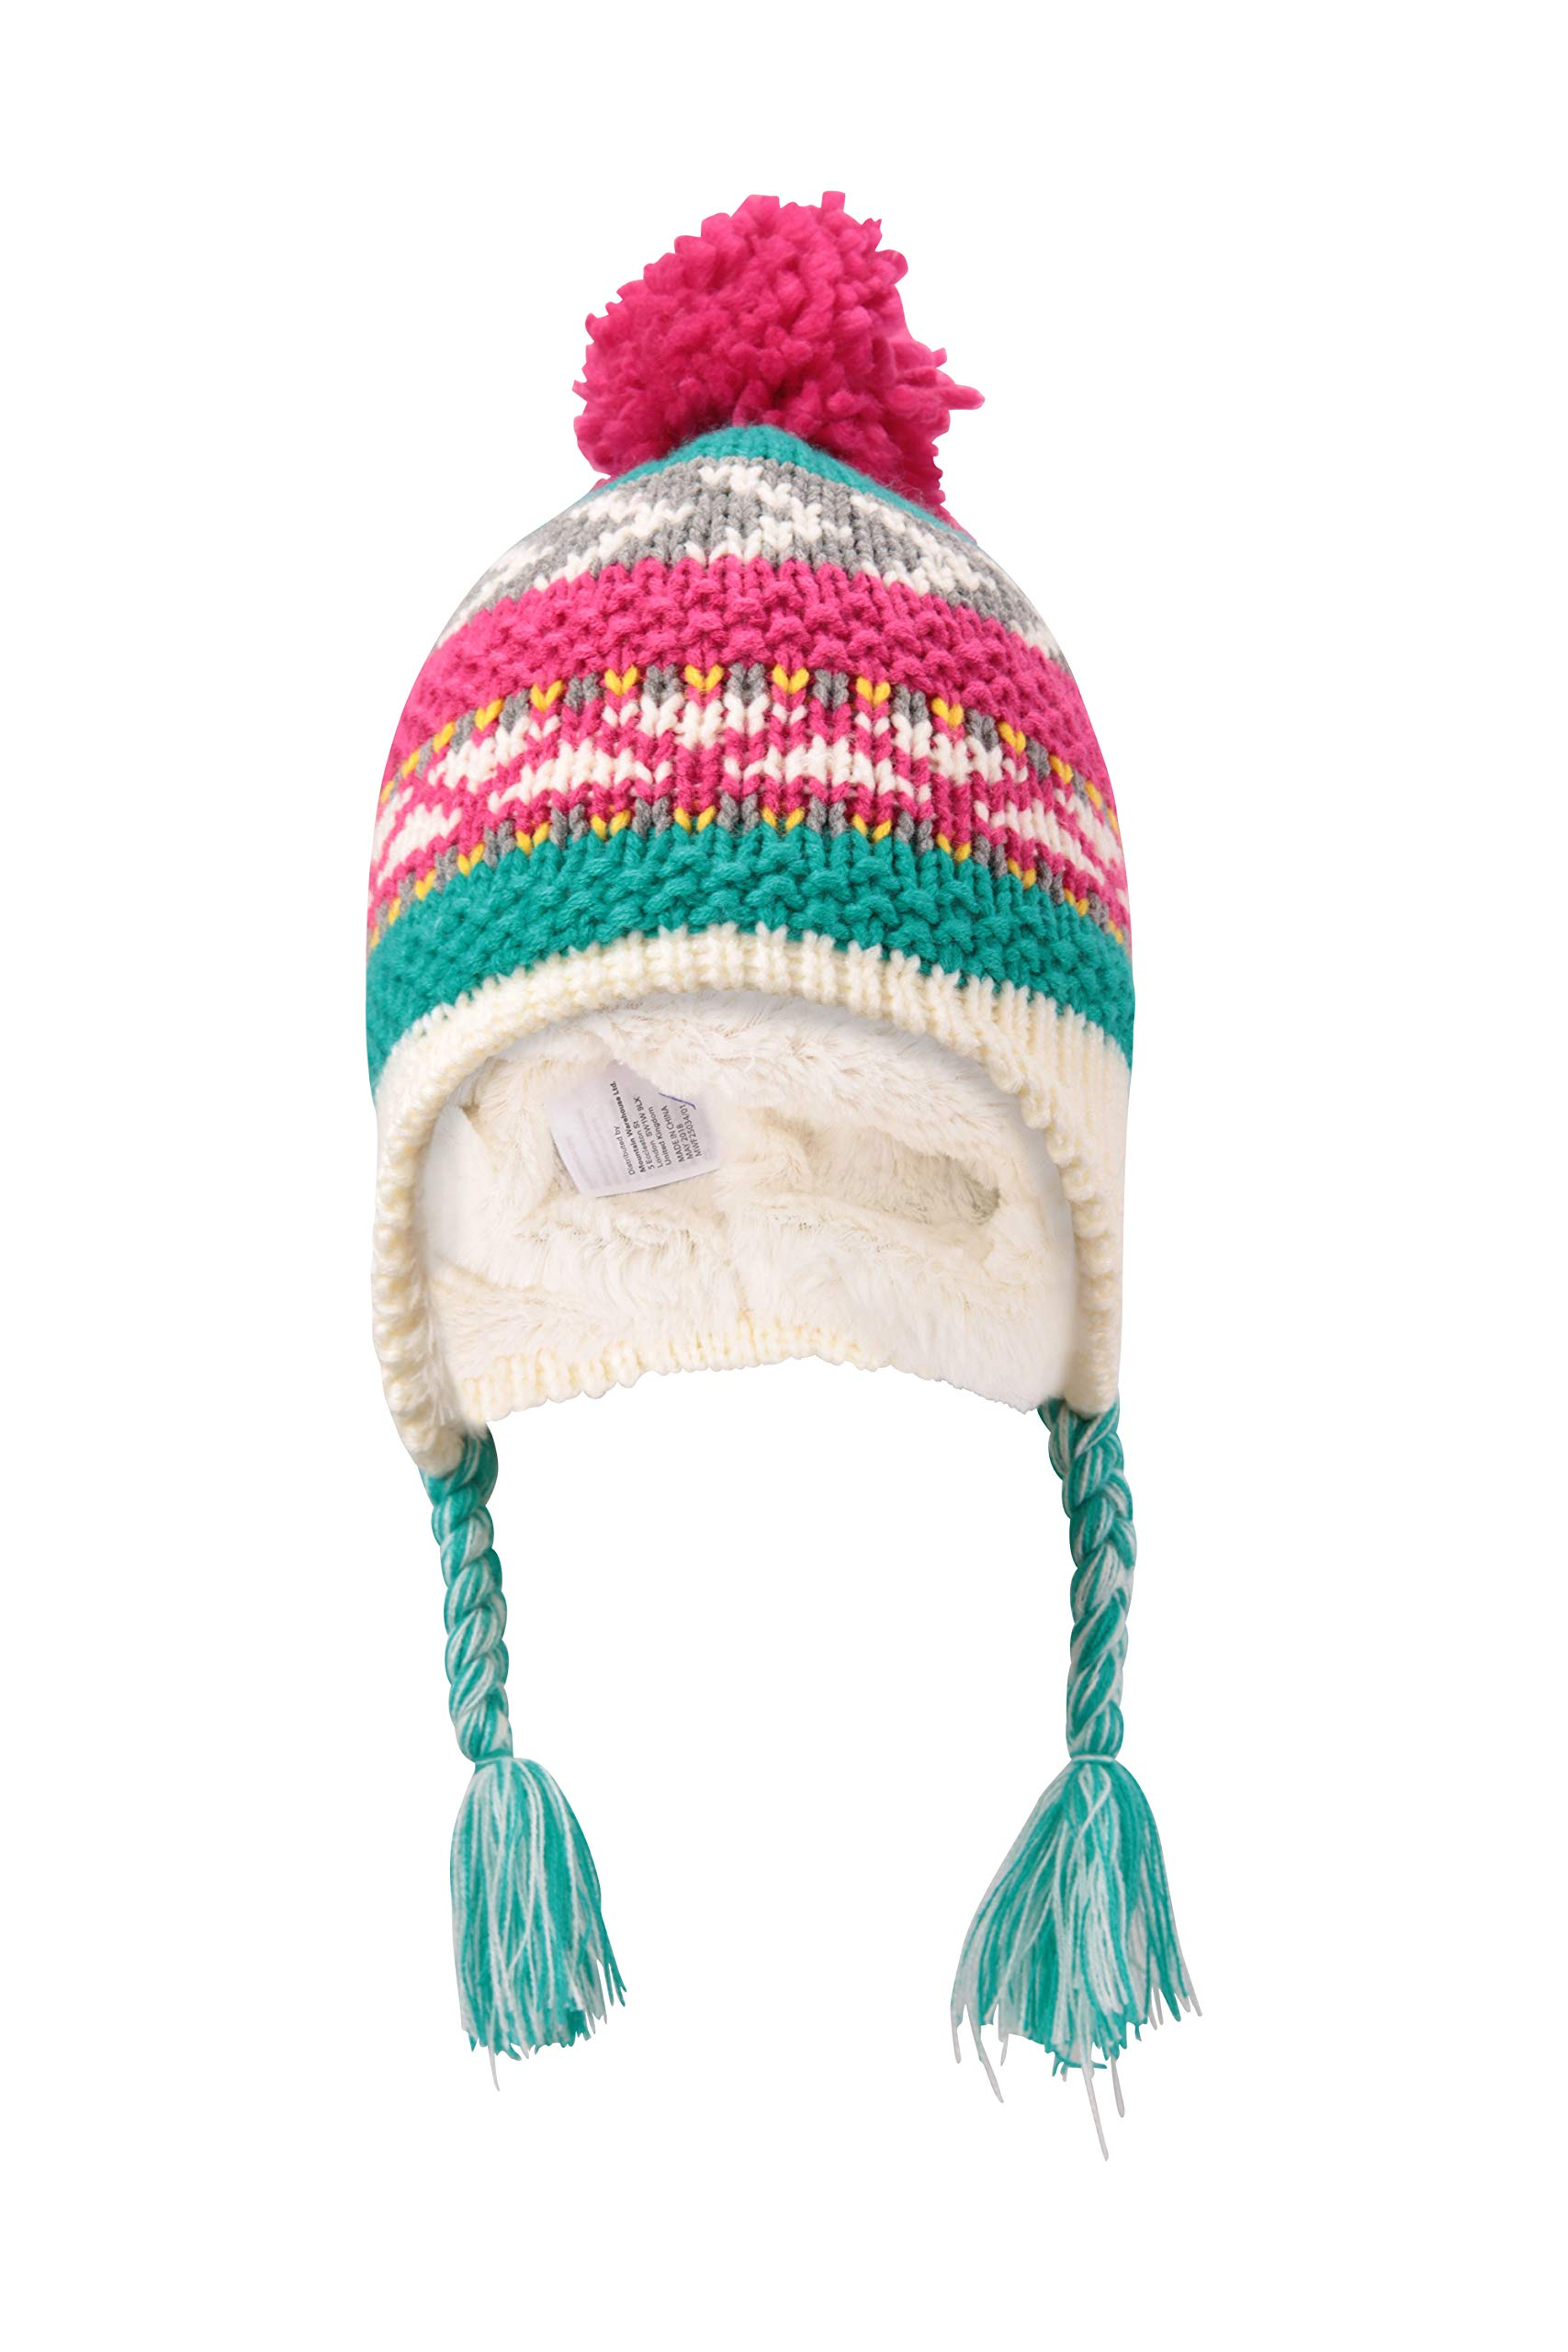 Mountain Warehouse Patterned Stripe Knit Kids Hat Teal